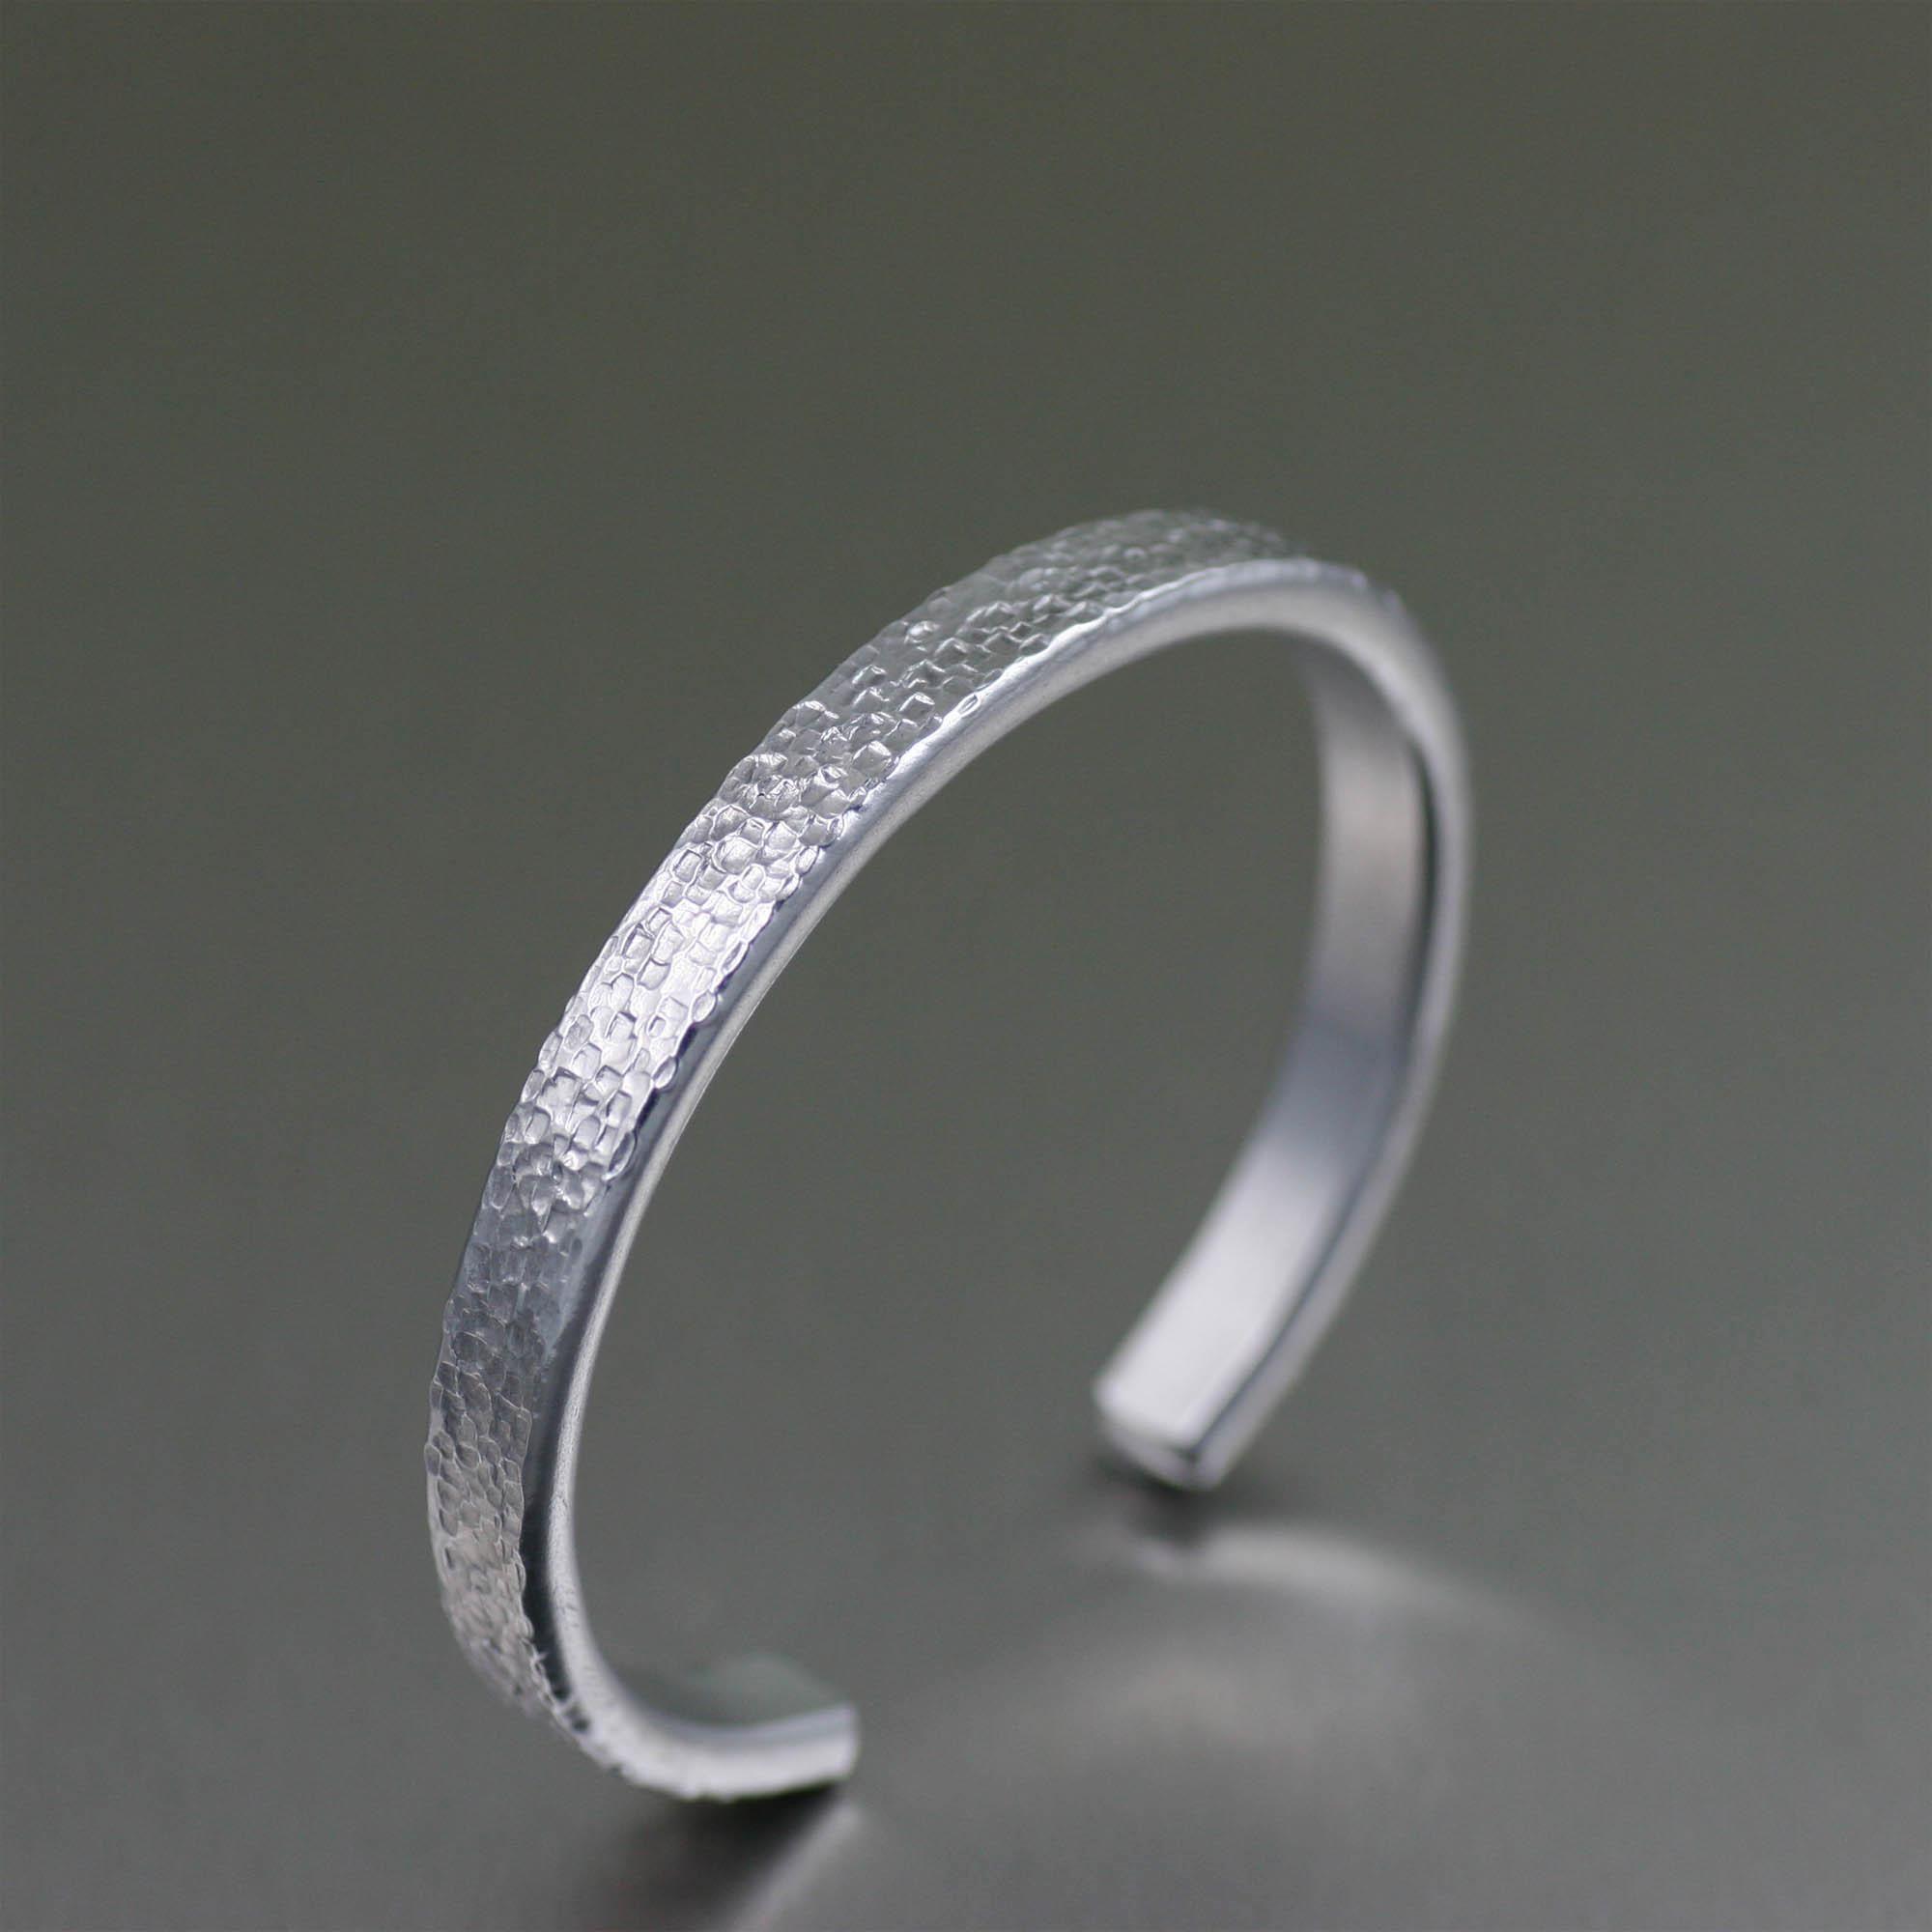 NEW! Phenomenal Silver-Toned Thin Texturized Unisex Cuff Featured on #Amazon #Bracelets http://www.amazon.com/dp/B015YQJNJ8